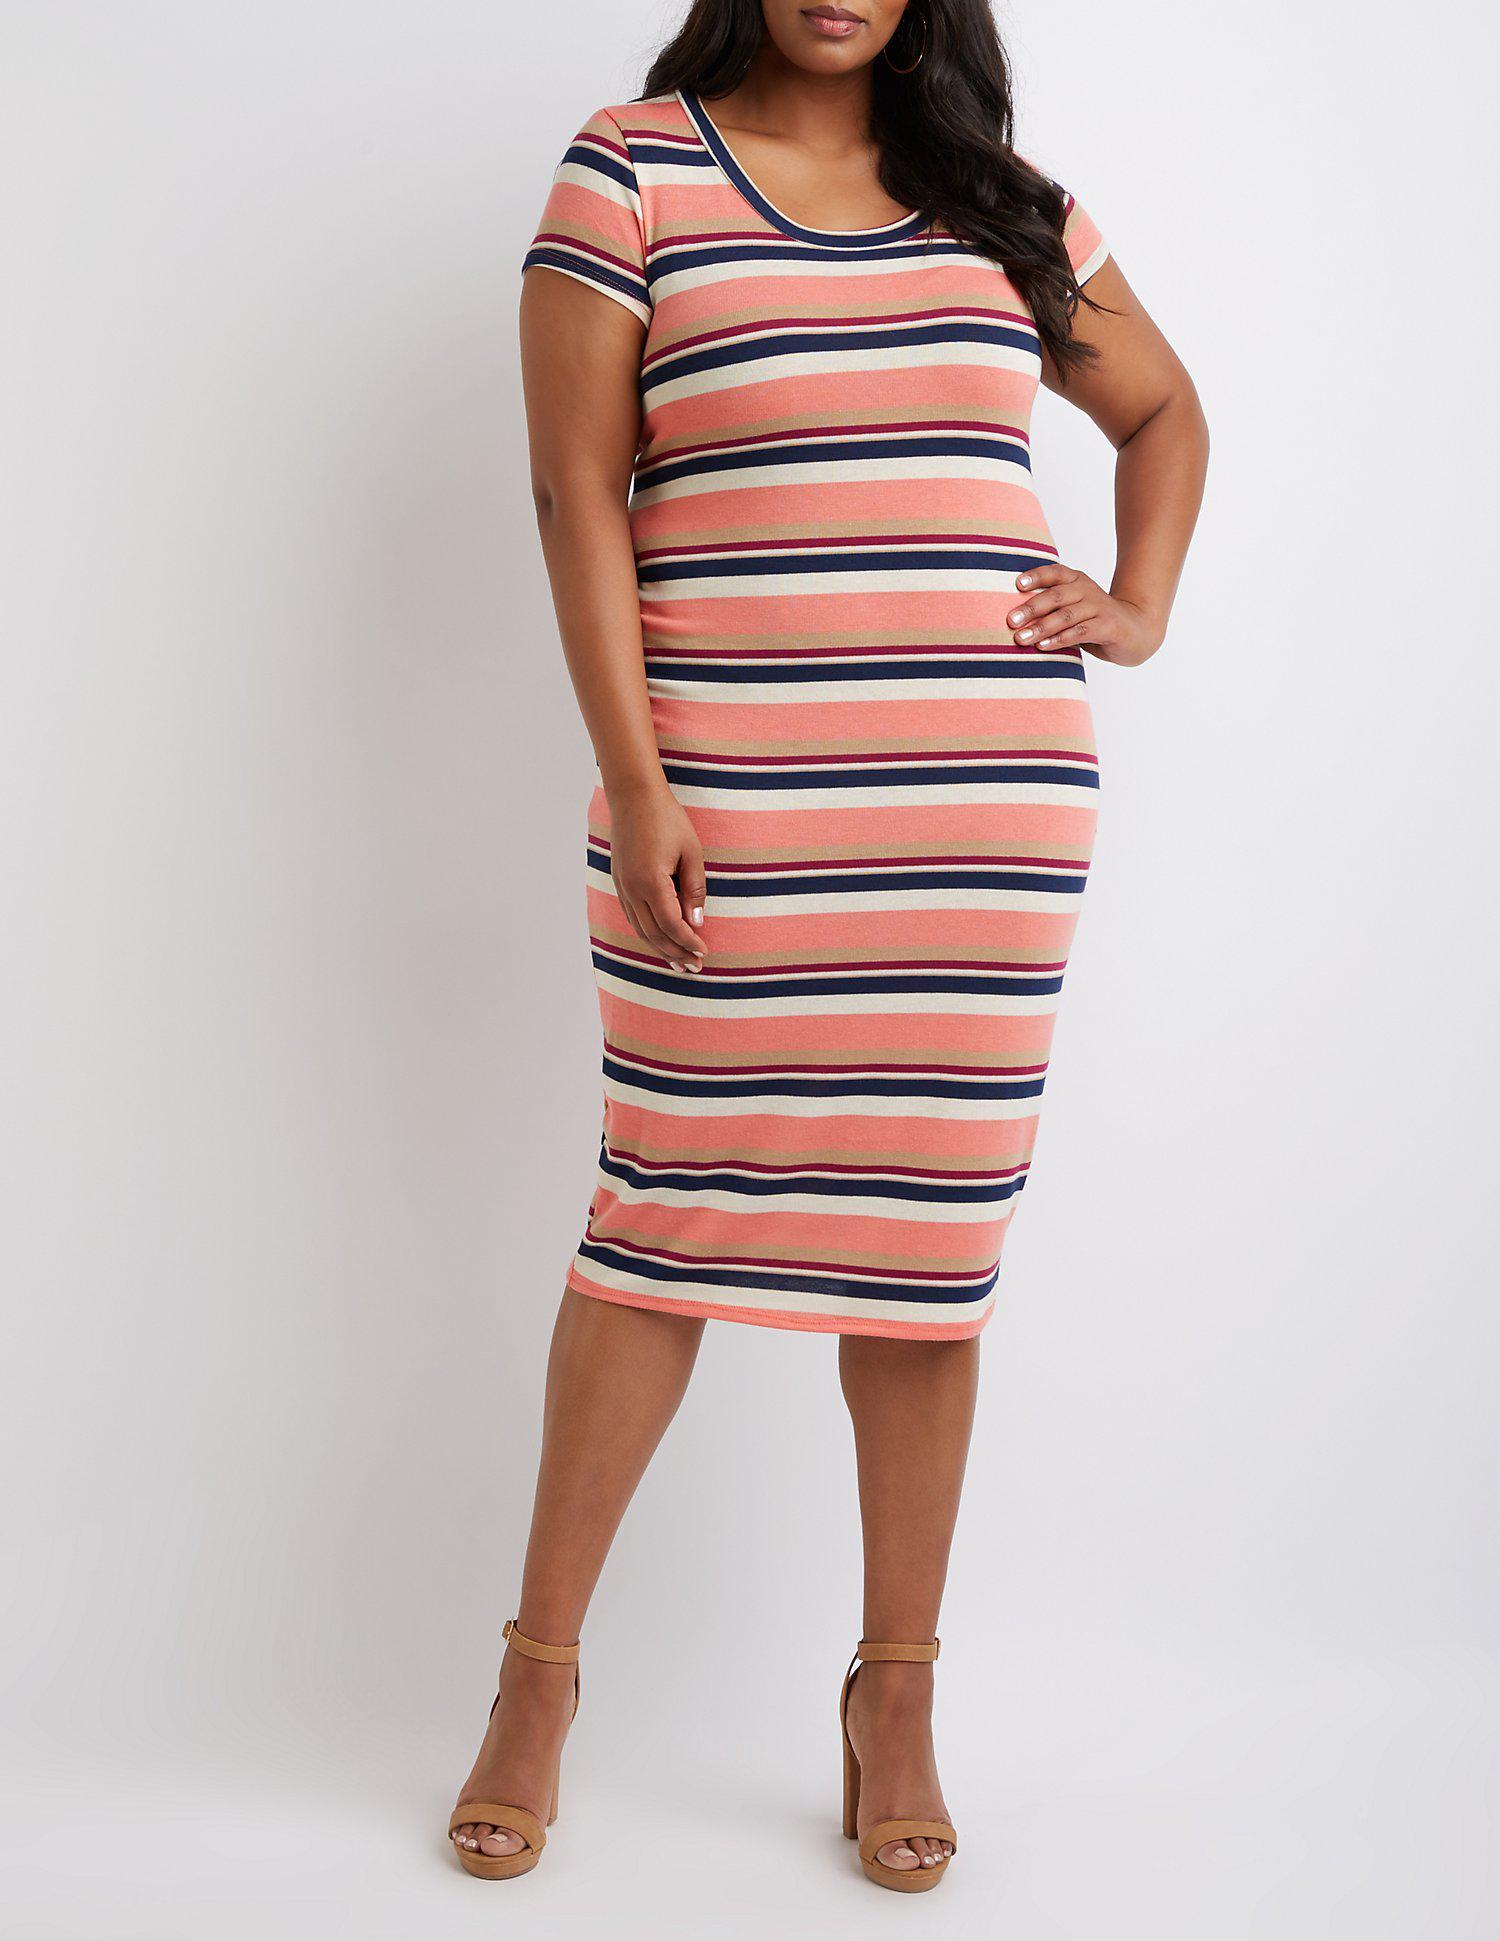 eaccd7f40c4 Lyst - Charlotte Russe Plus Size Striped Shirt Dress in Orange